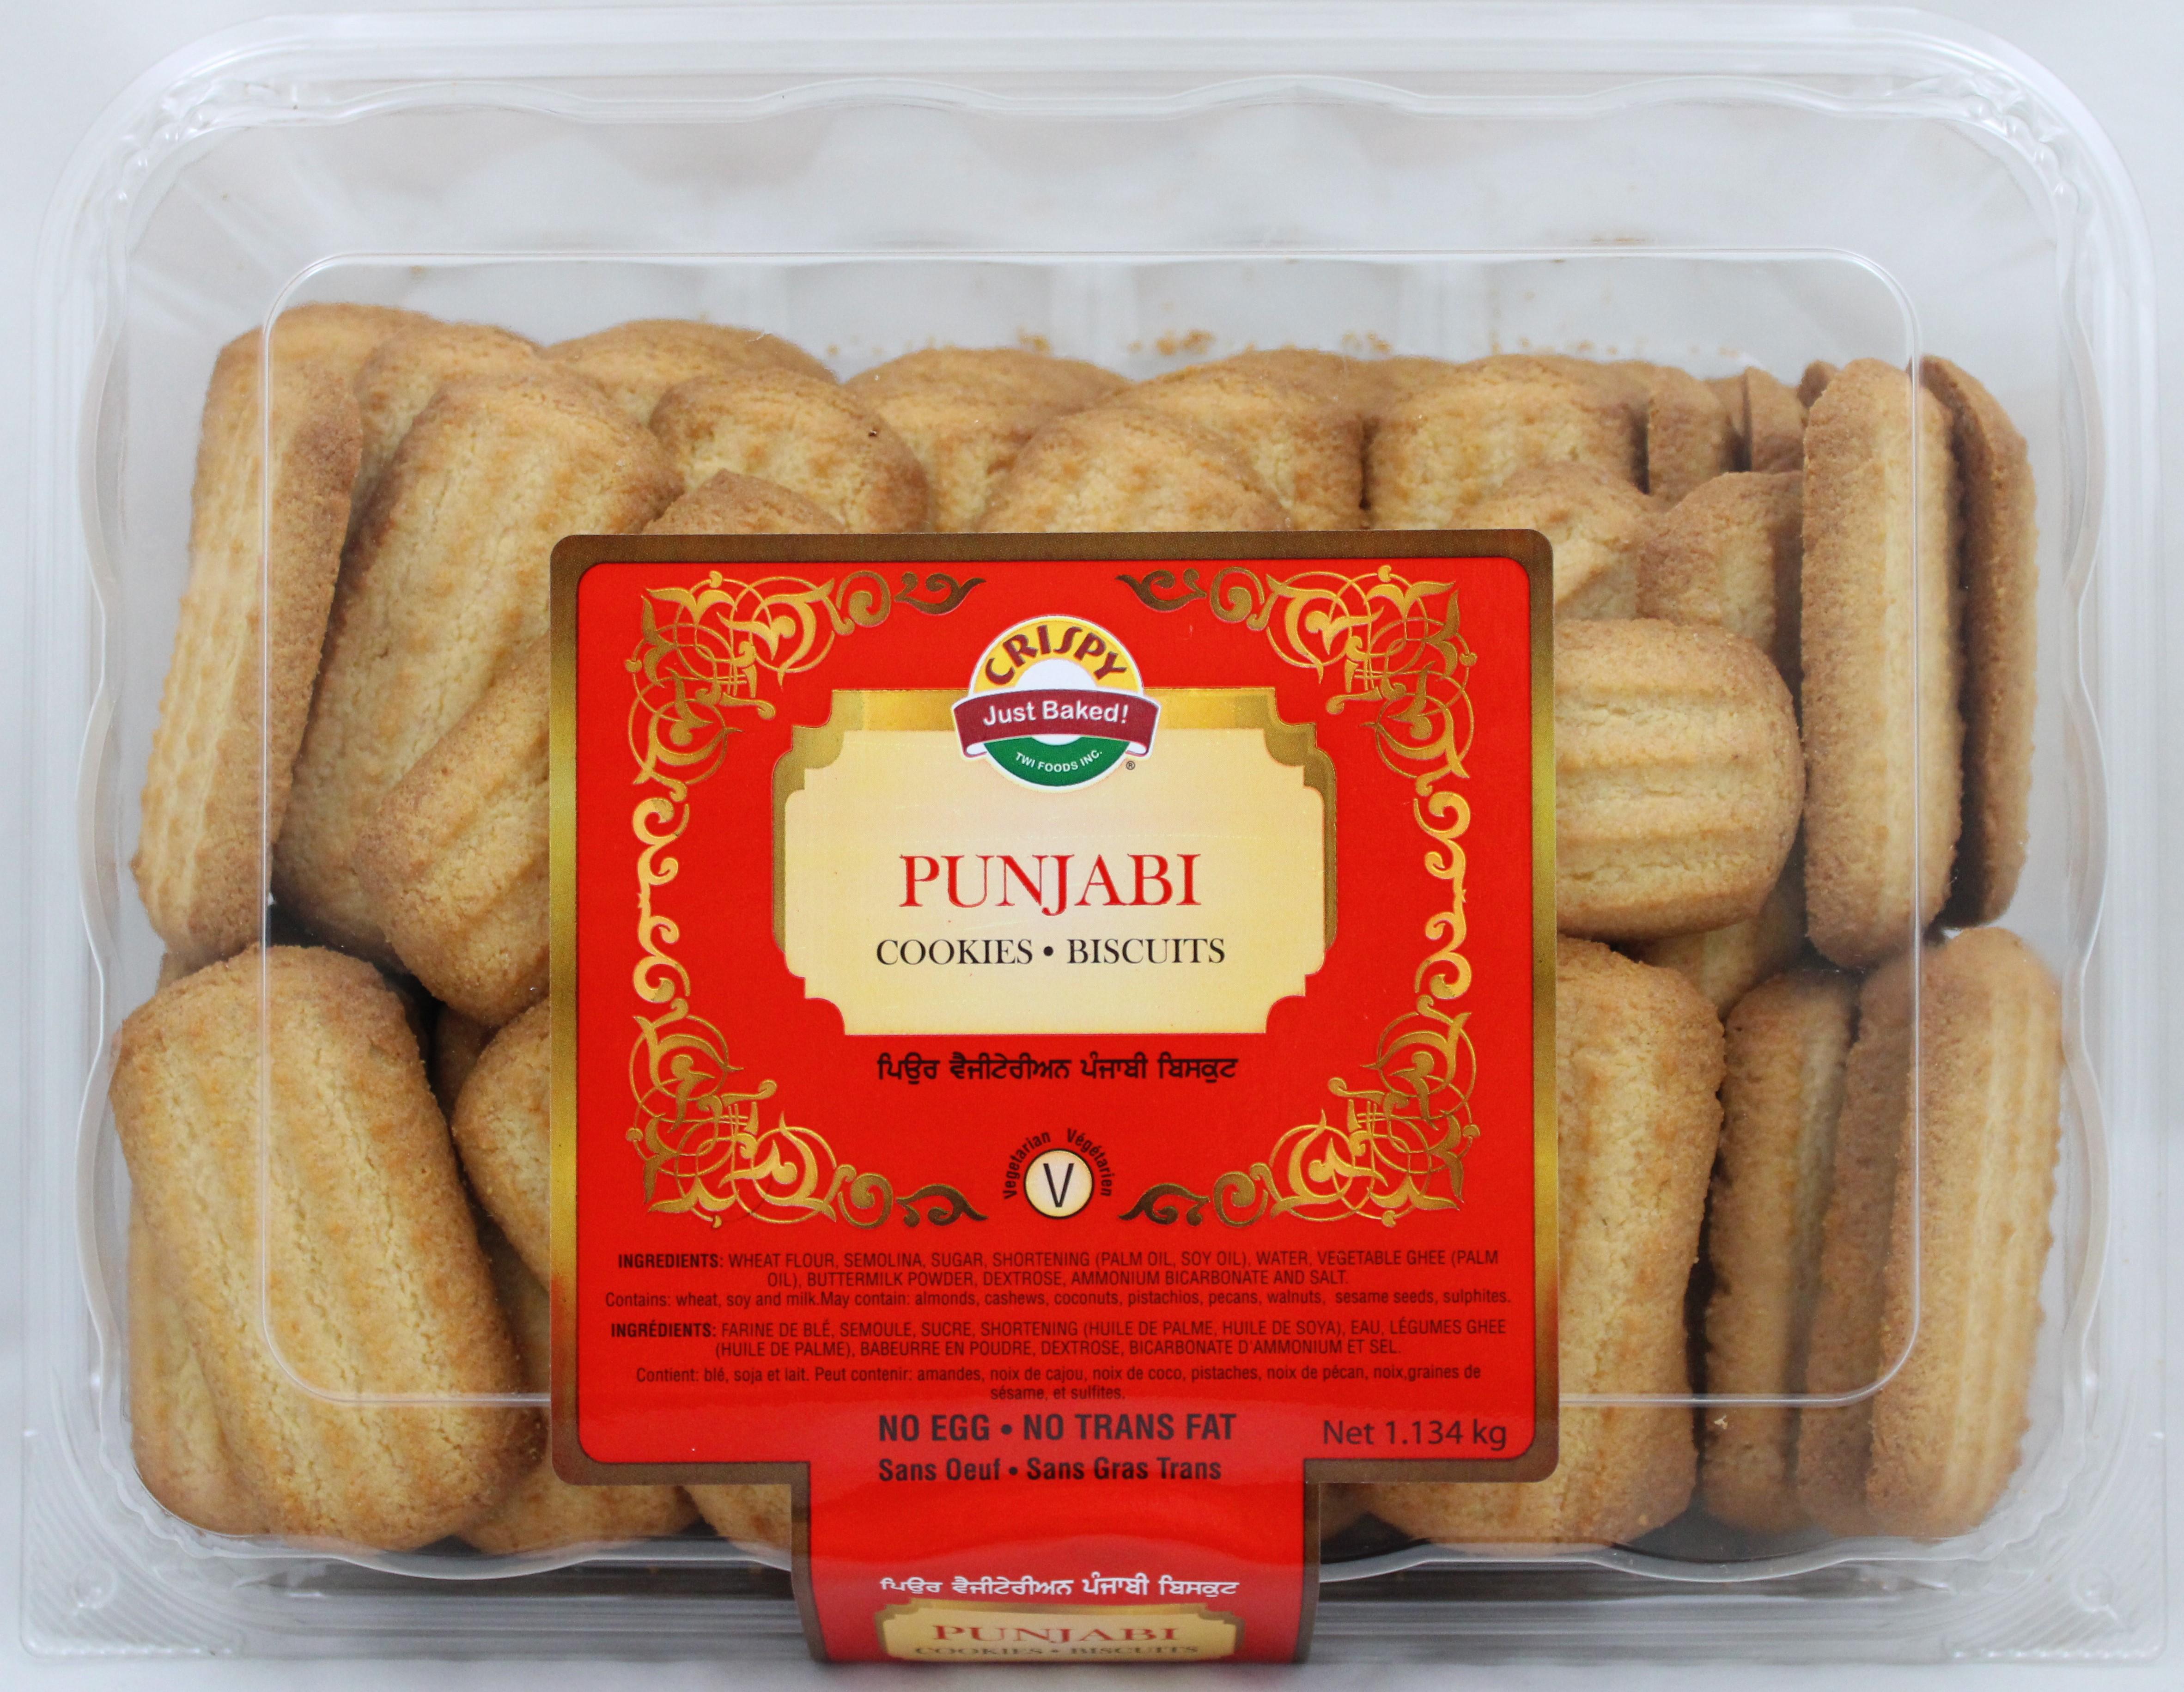 Punjabi Cookies 2.5Lb